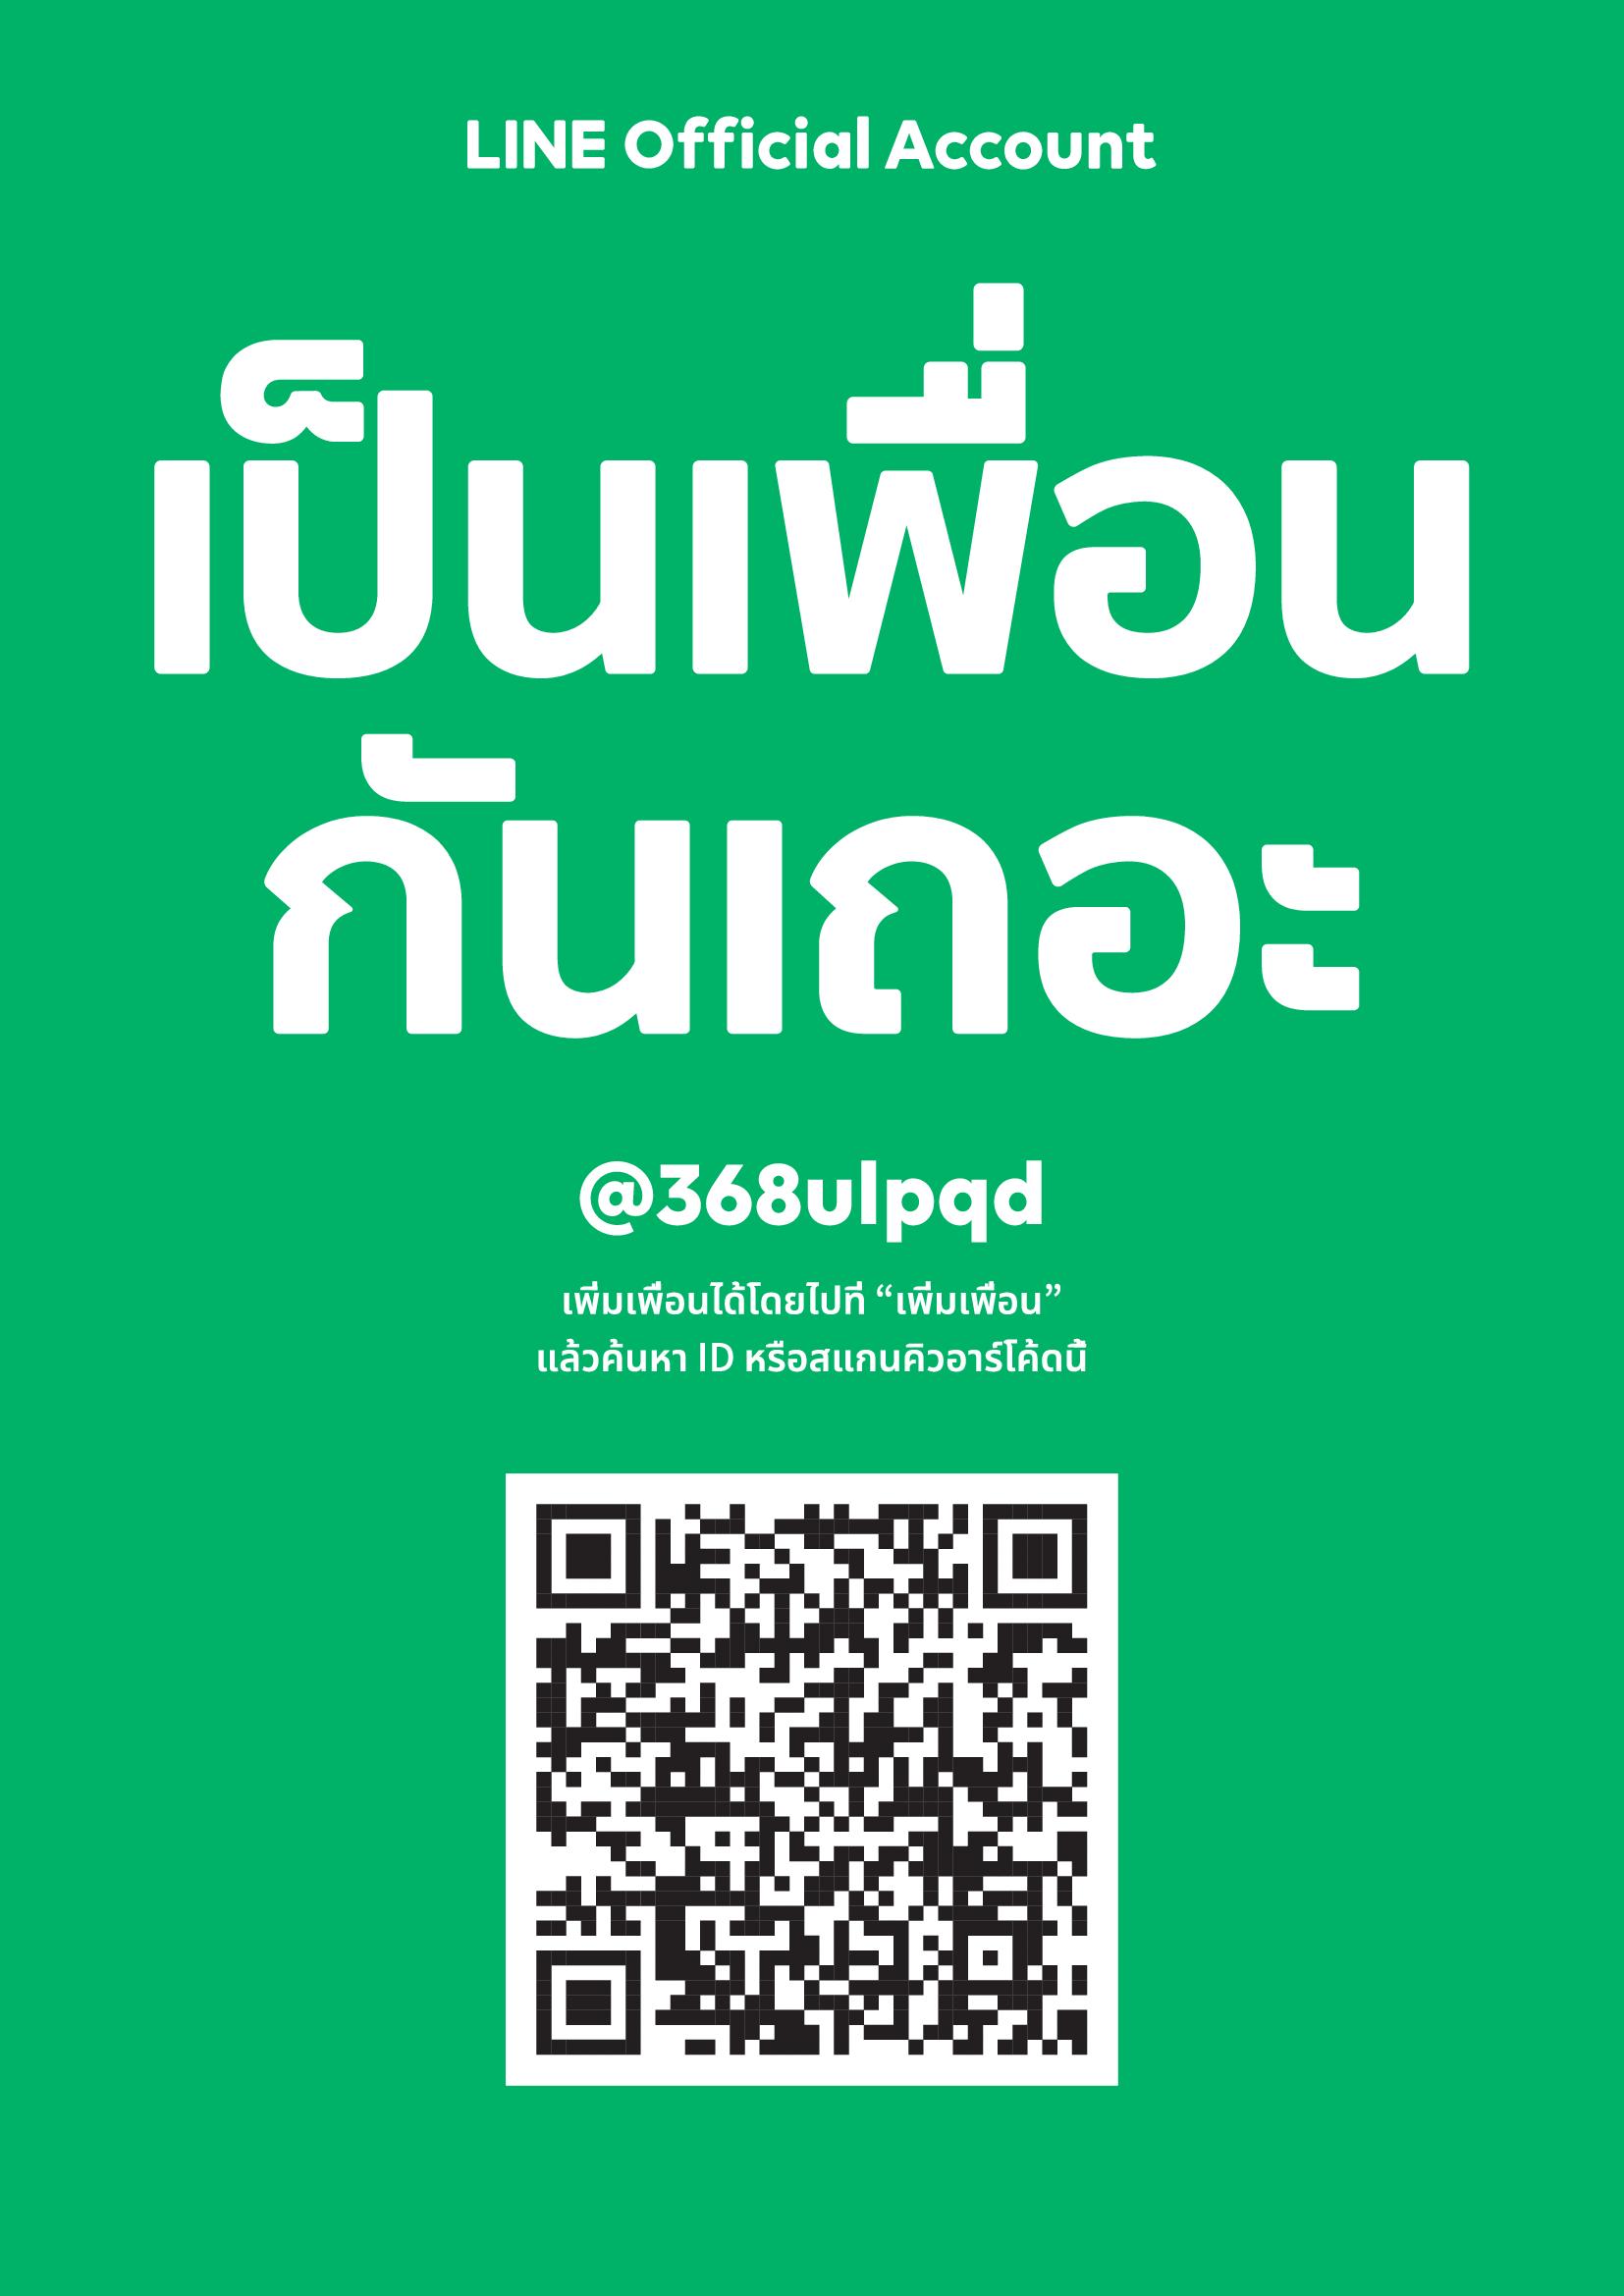 LINE Official Account ประกันสังคมจังหวัดชัยภูมิ